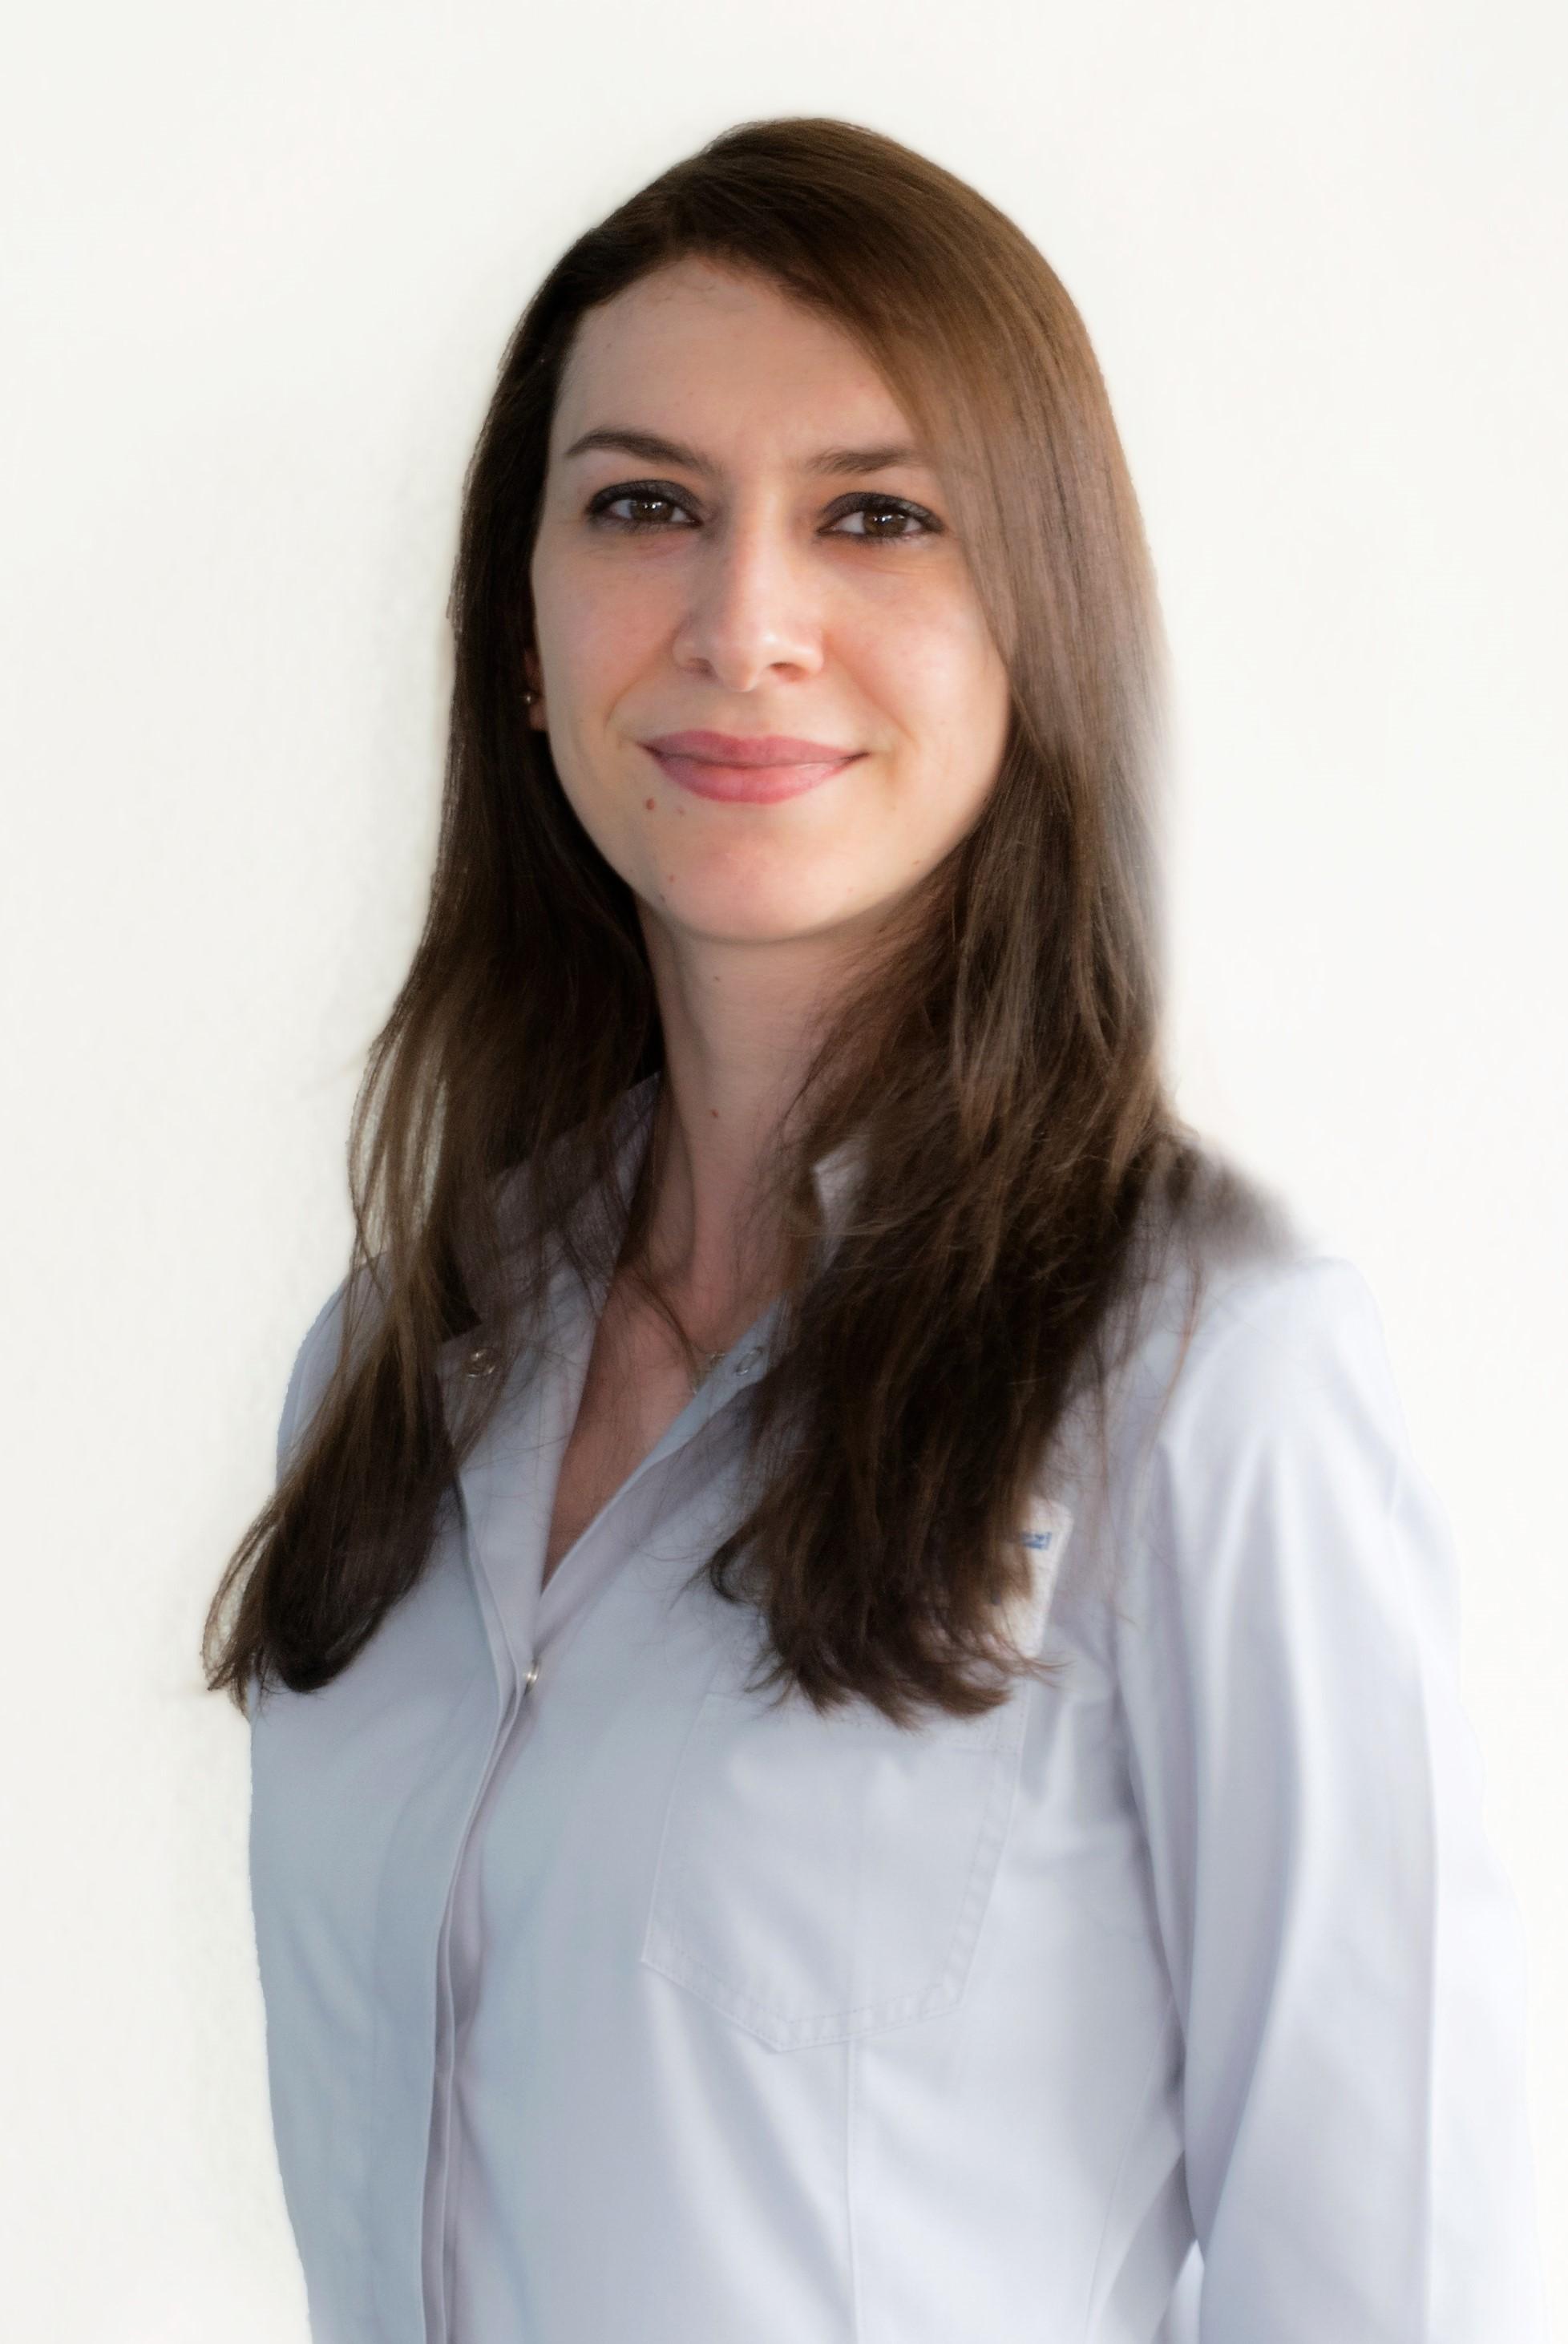 ELZANA KAZIMOSKA